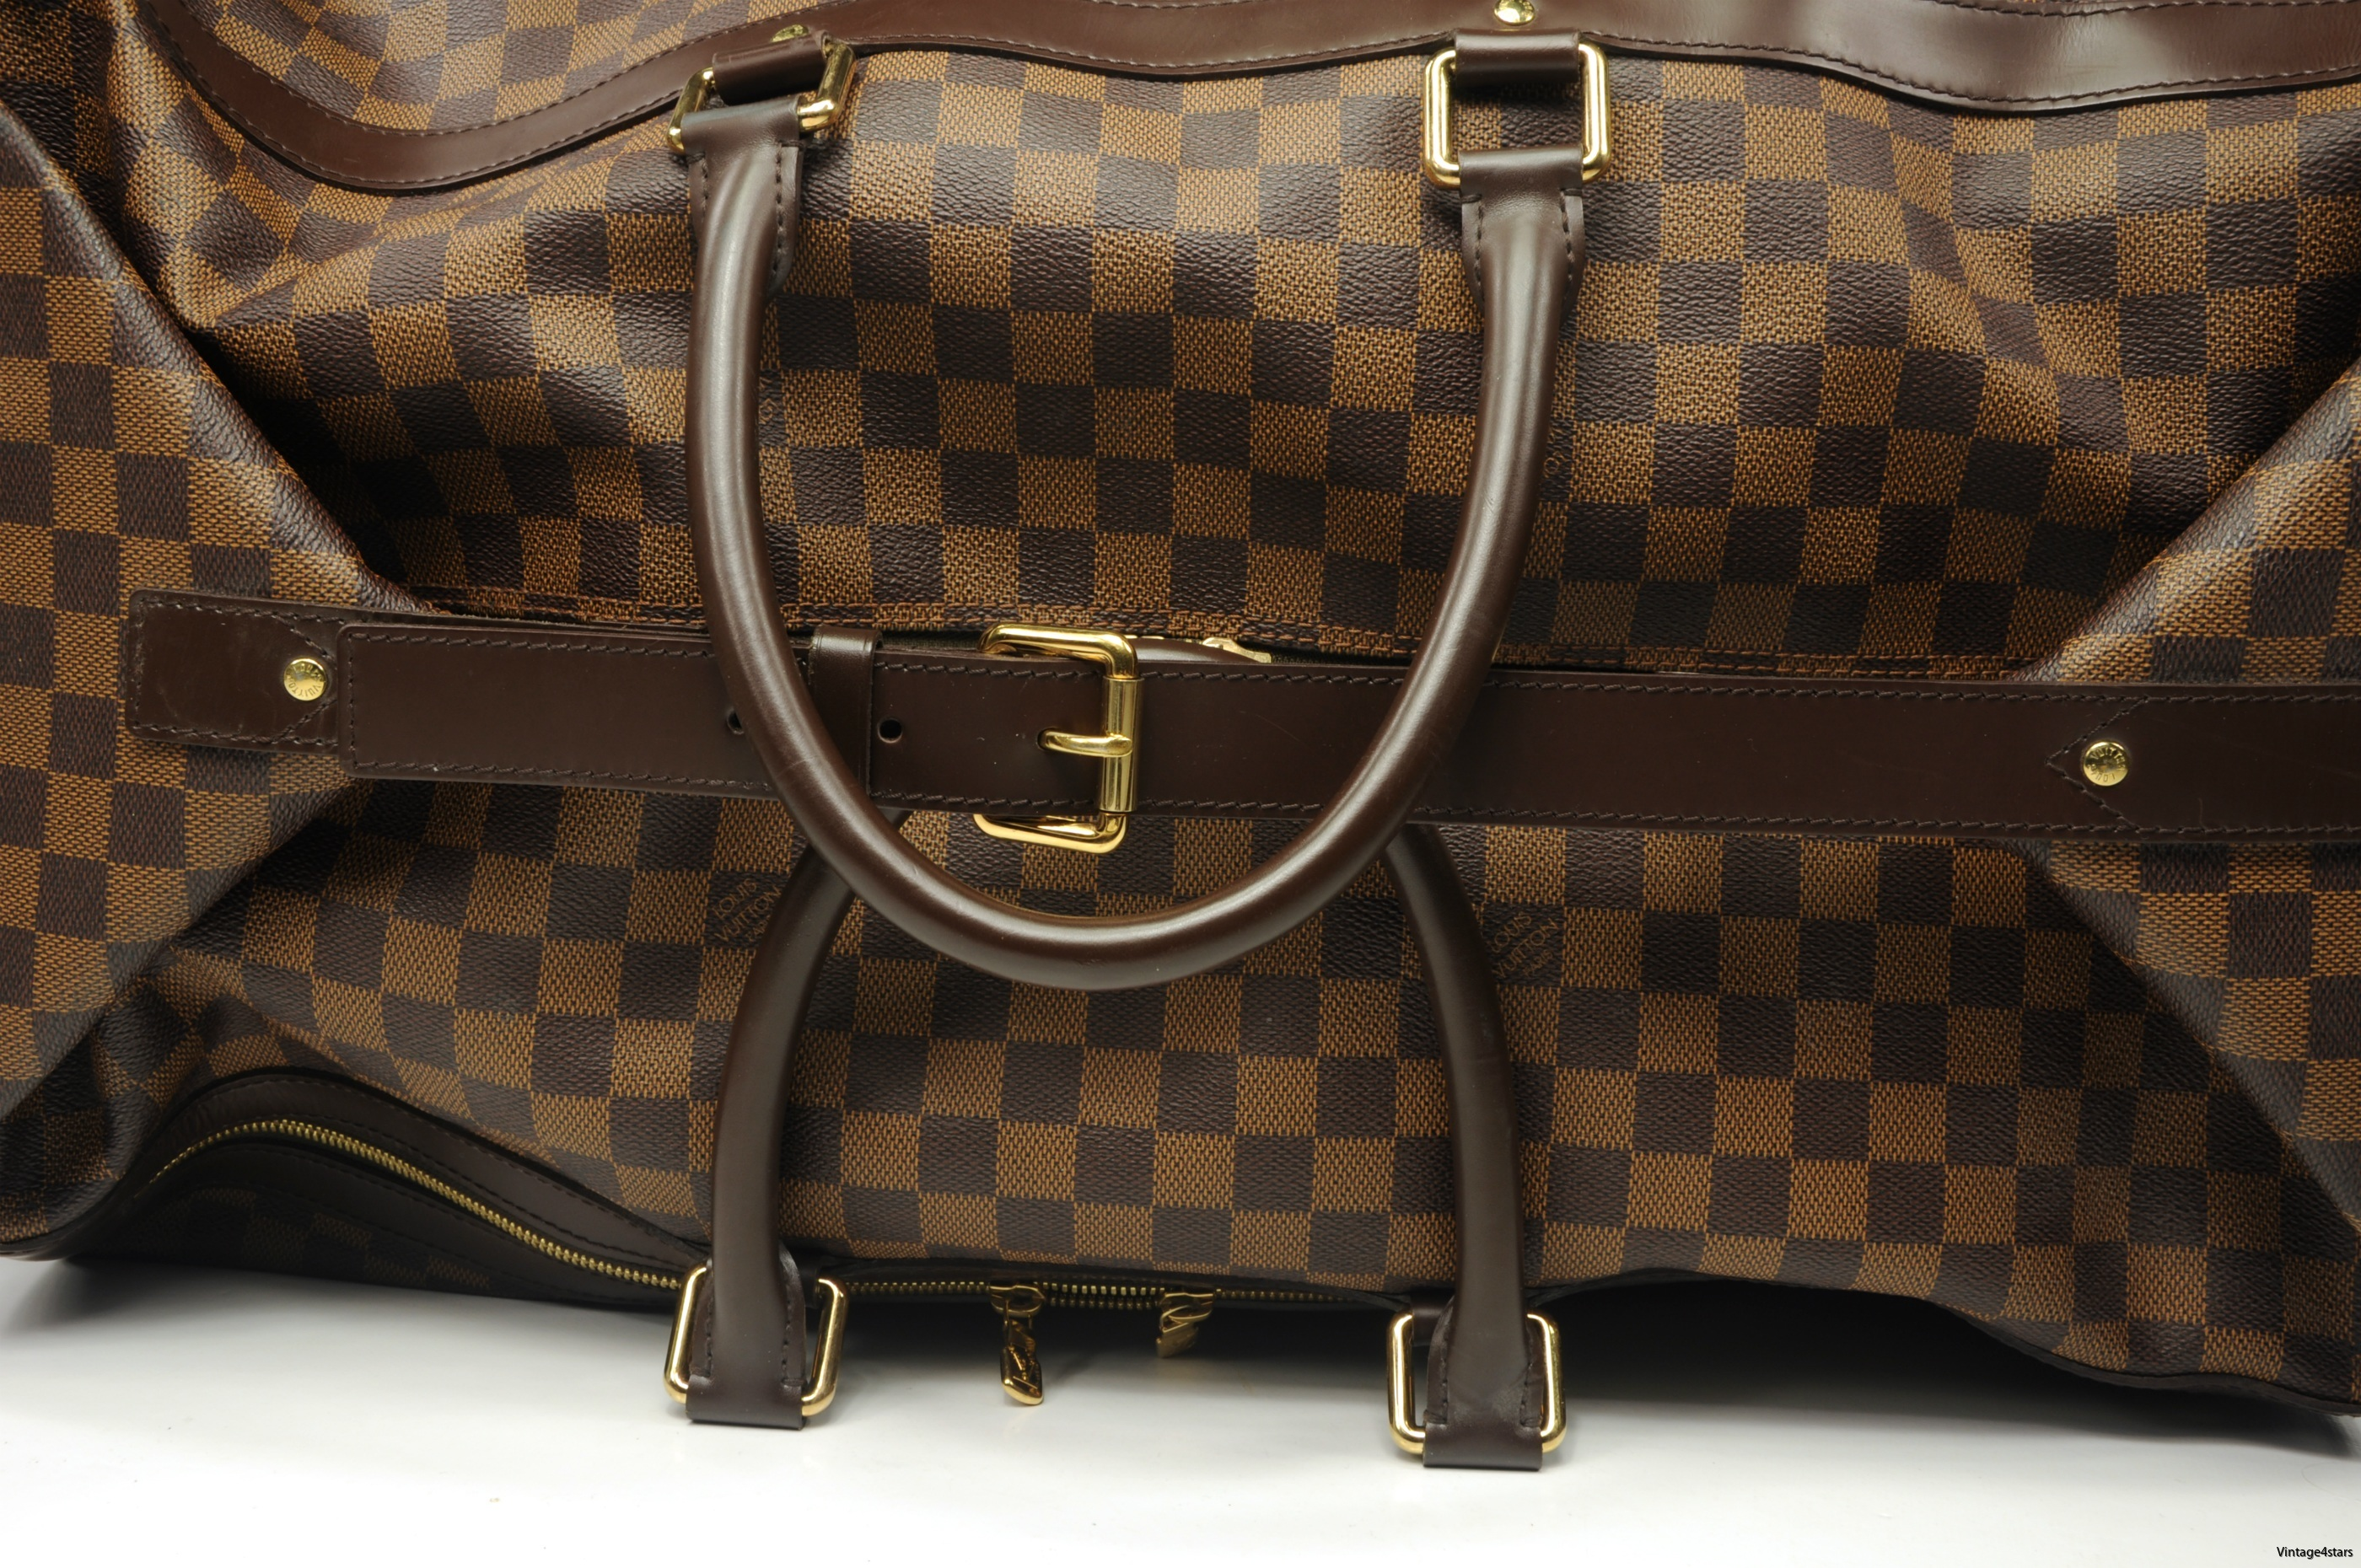 Louis Vuitton Eole 60 Damier Ebene 9